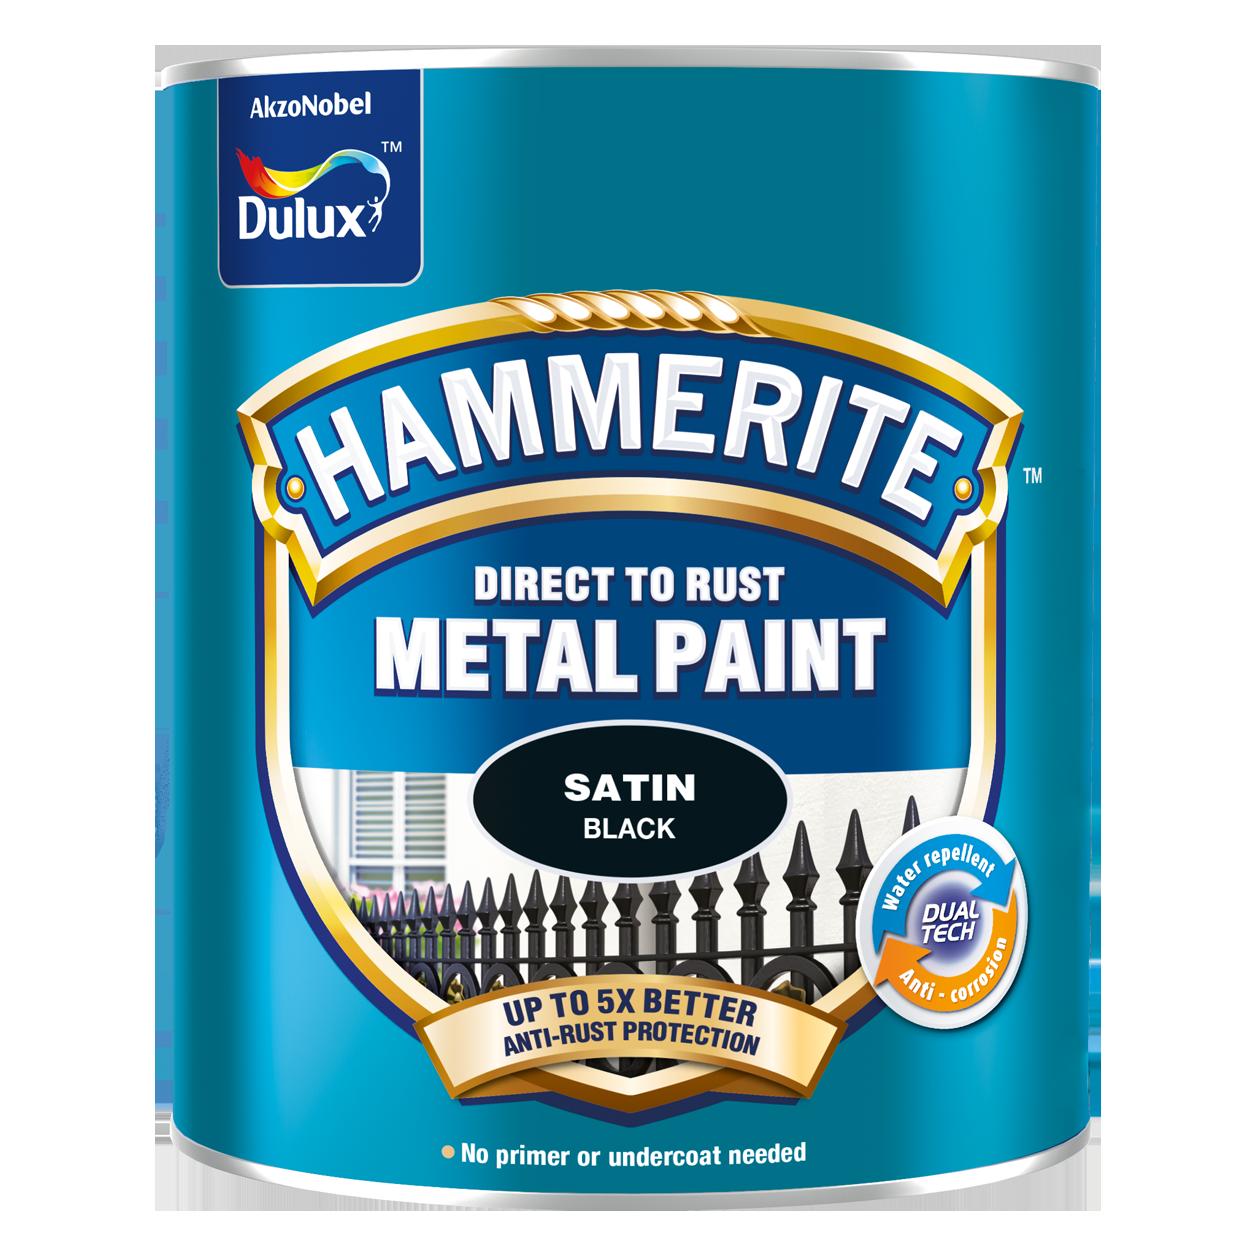 Sơn Kim Loại Hammerite Direct To Rust - Bề mặt bóng mờ